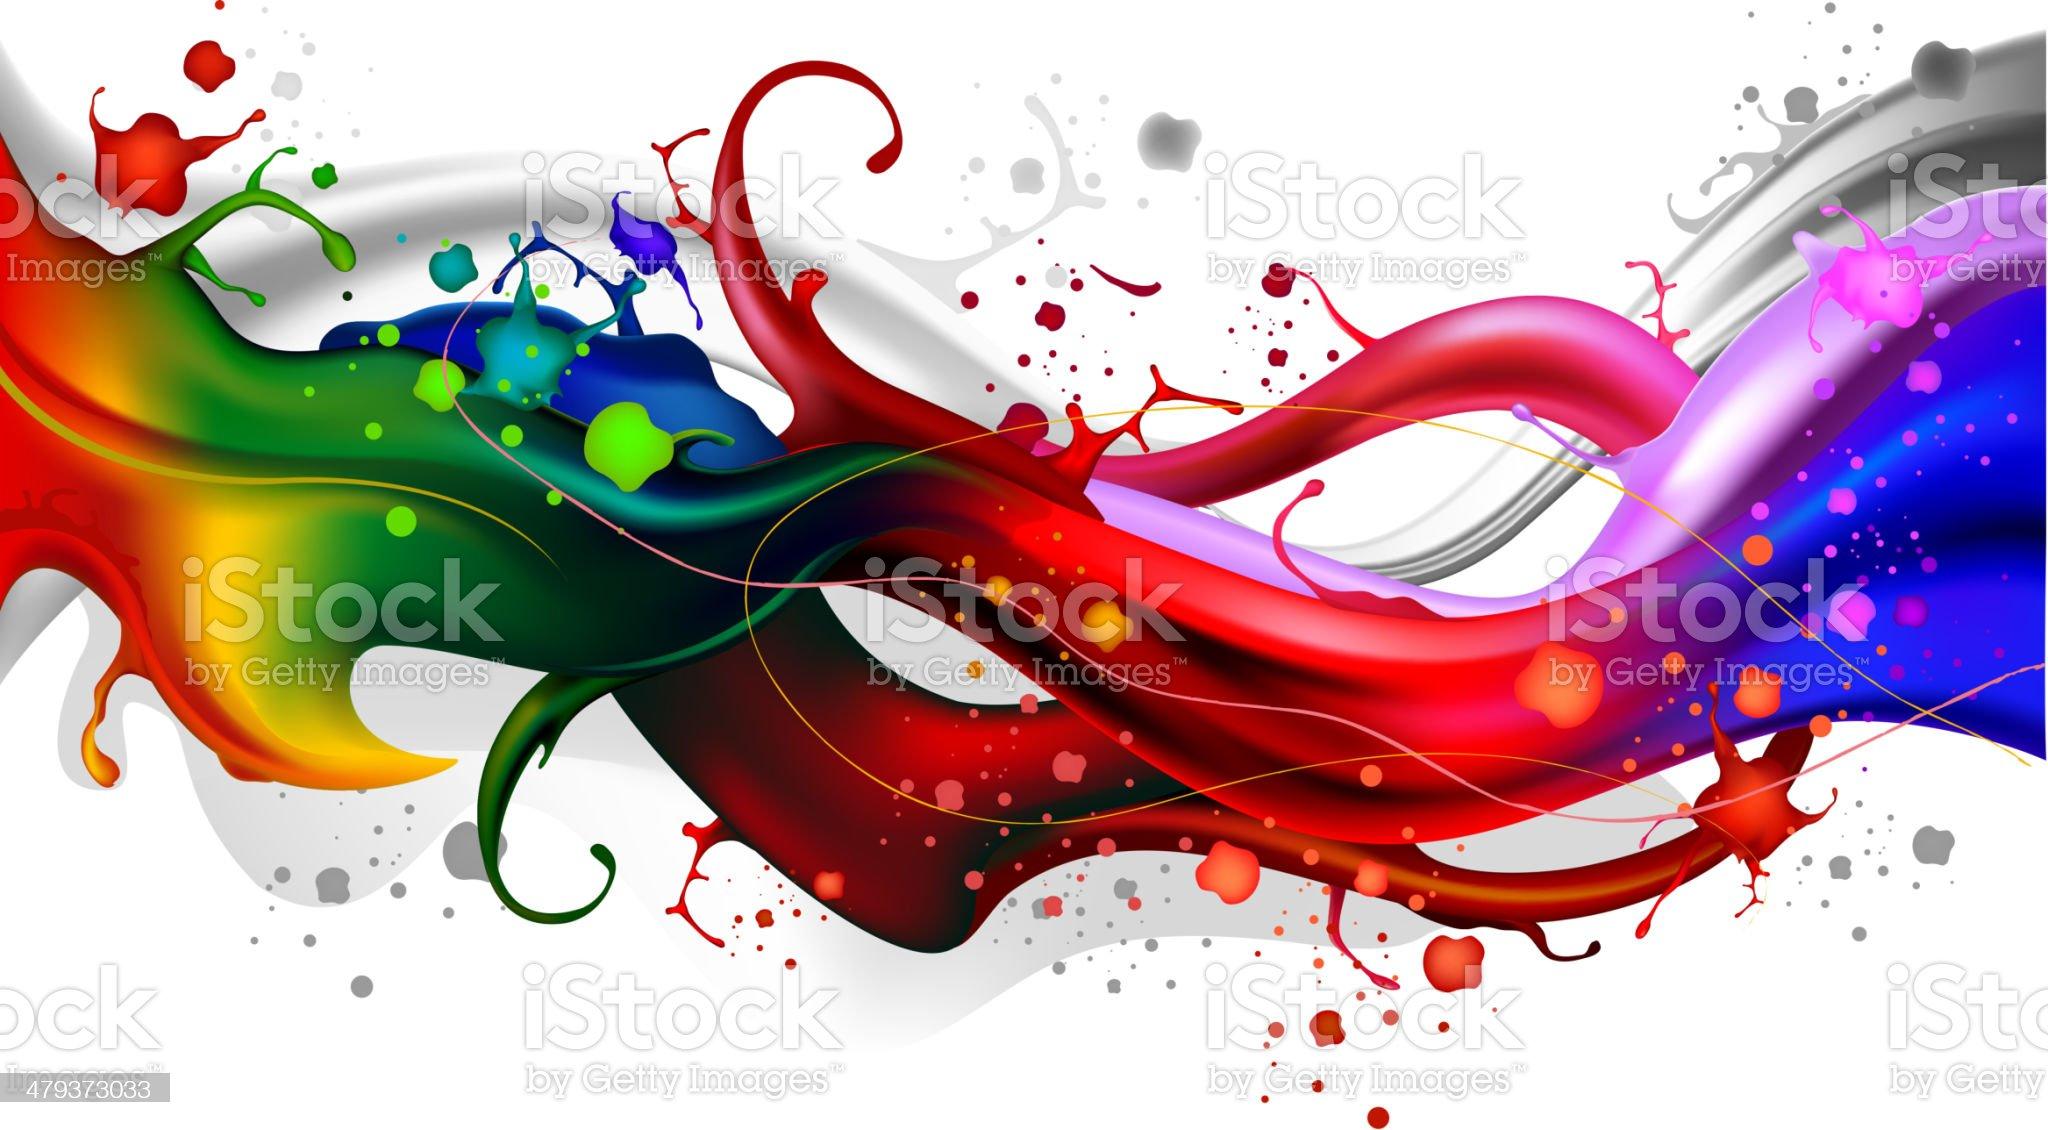 Colorful splash waves royalty-free stock vector art